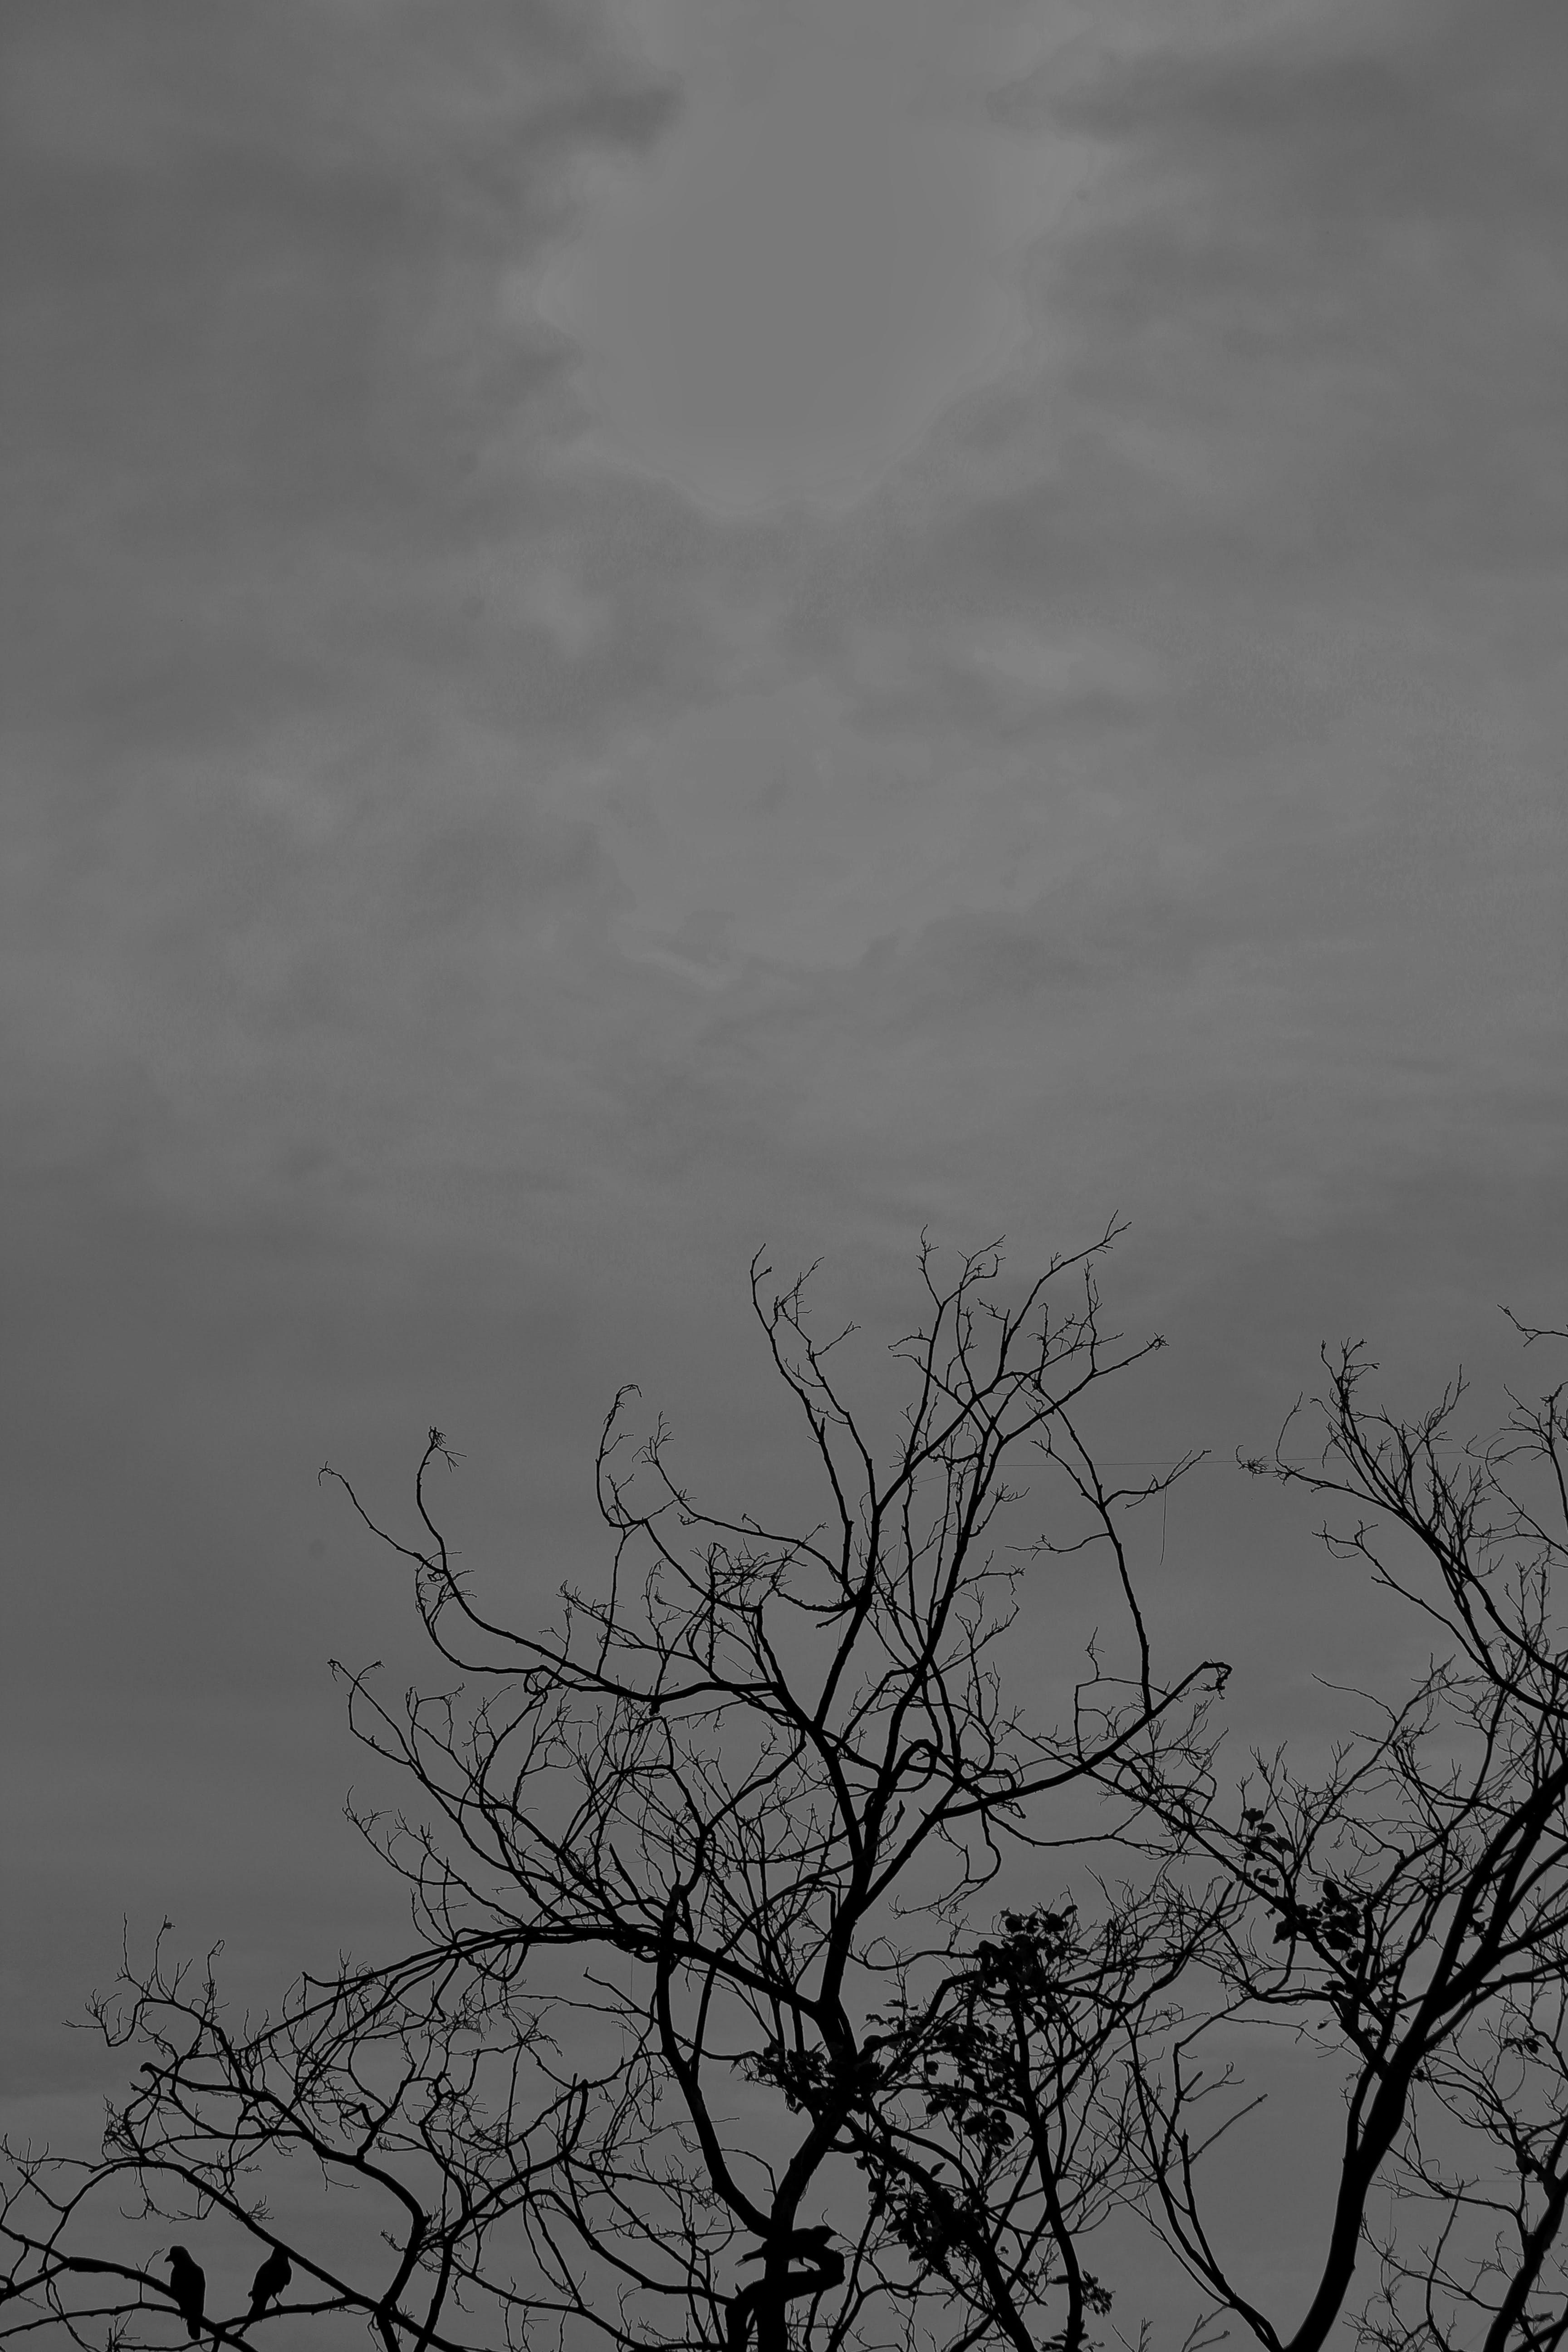 Kostnadsfri bild av svartvitt